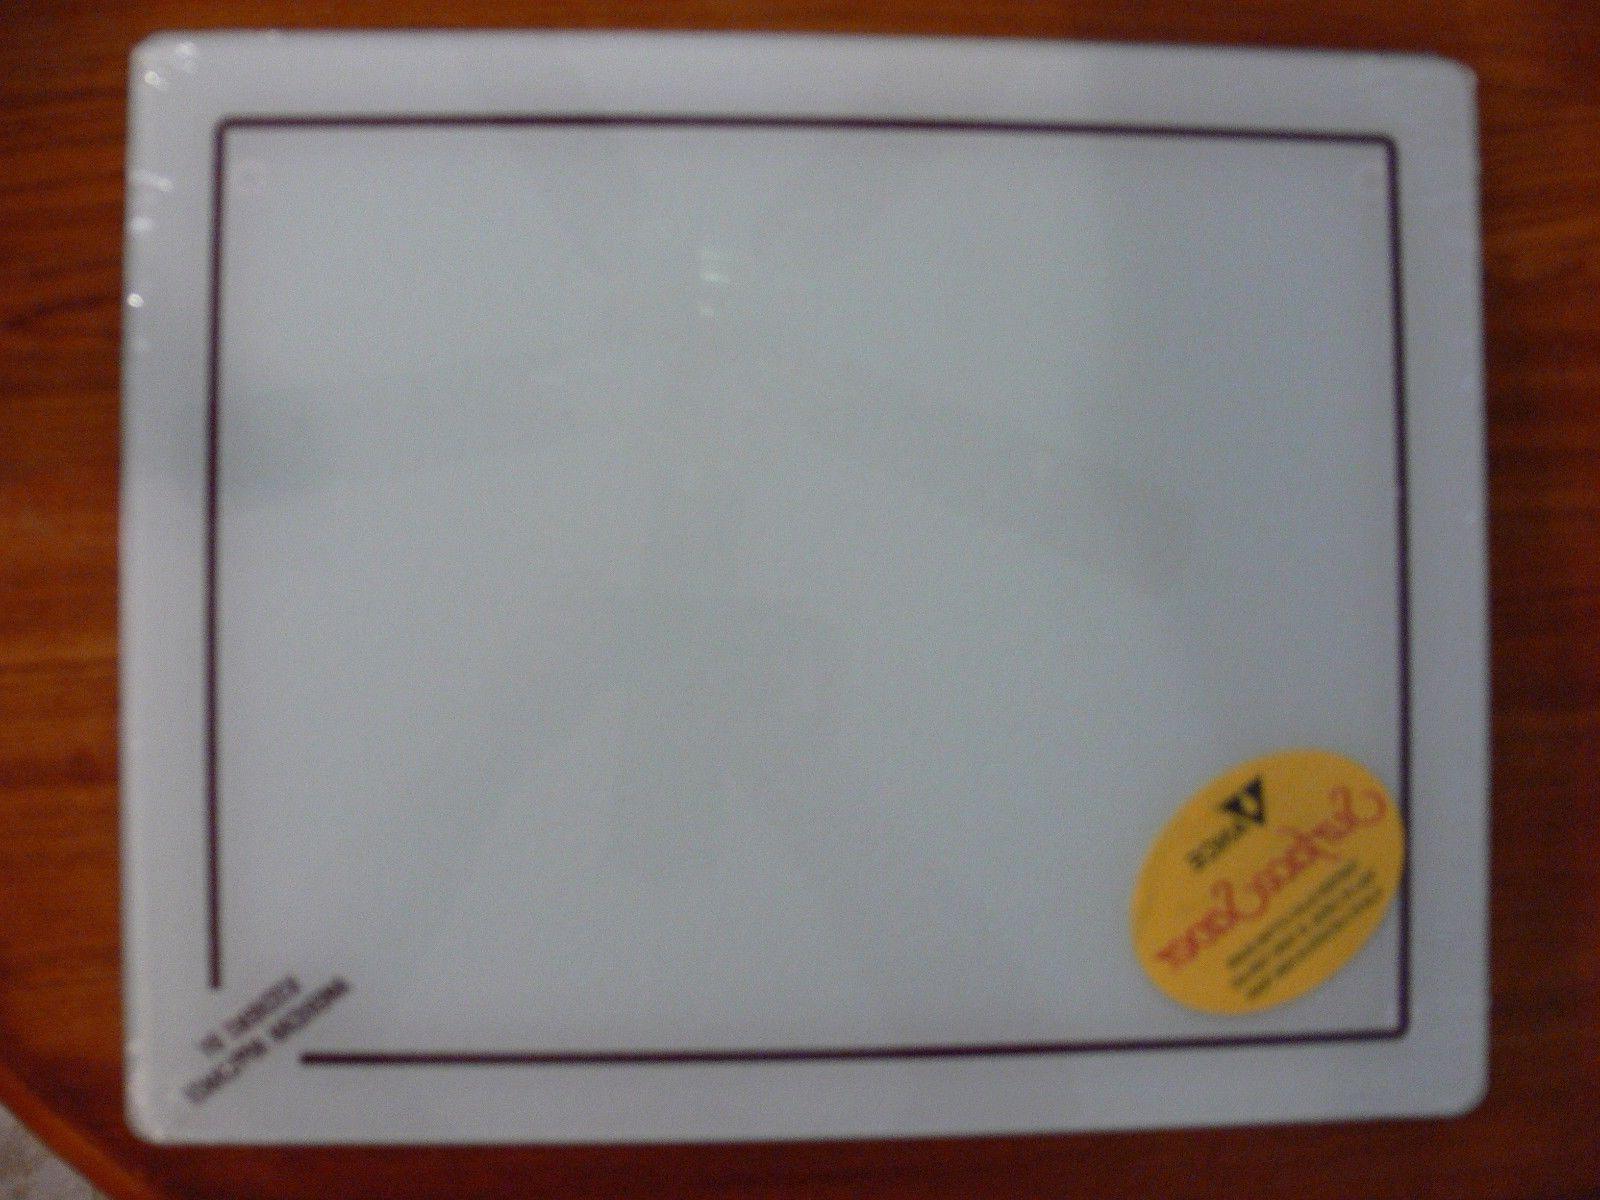 "New Vance Glass Cutting Board 16"" x 20"" Tempered Surface Sav"